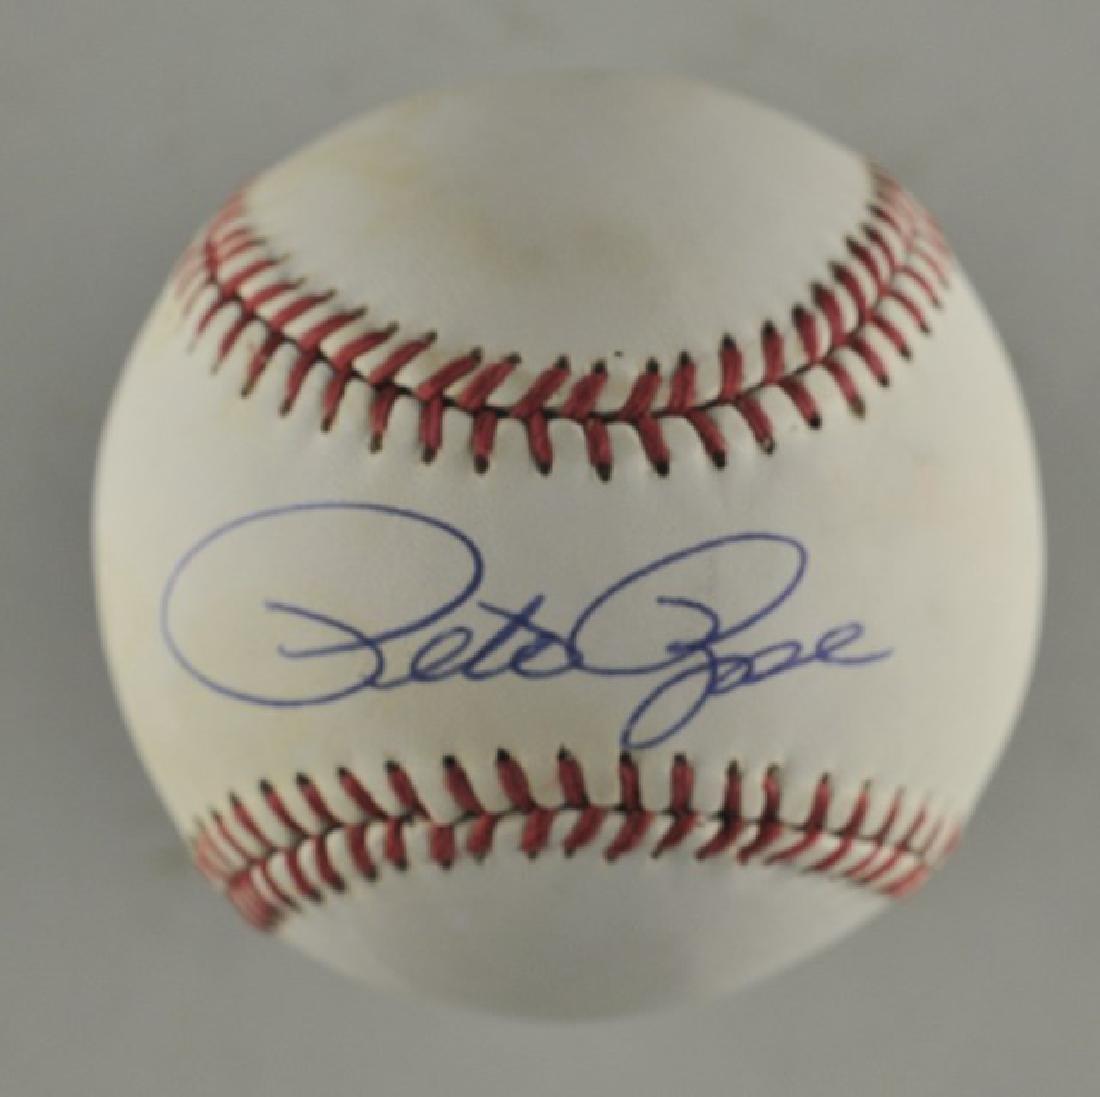 Signed Pete Rose Baseball